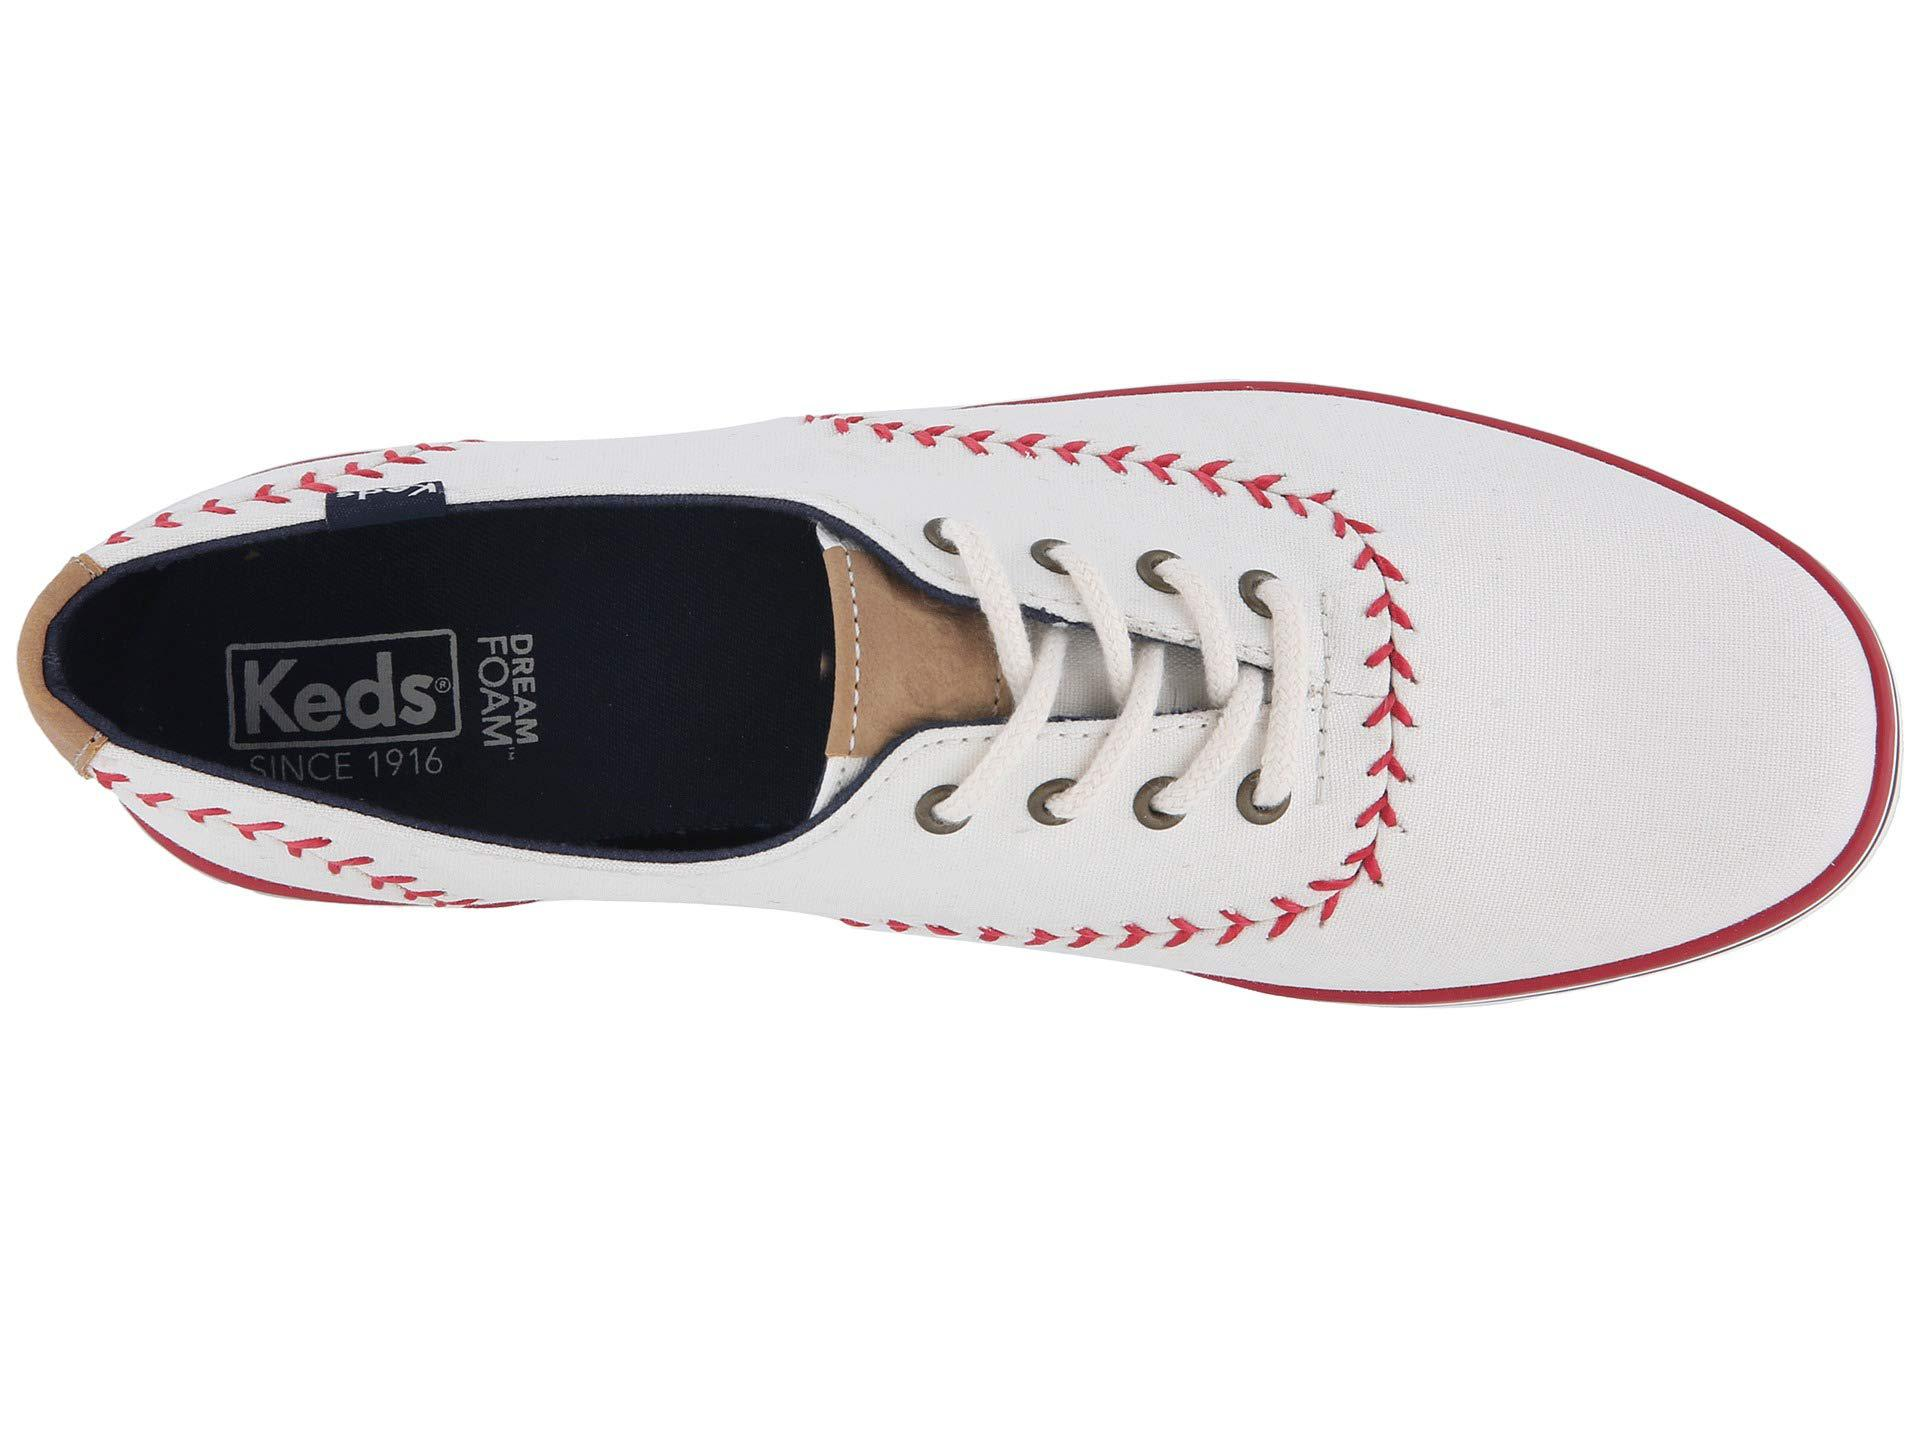 600709db0b1 Keds - White Champion Pennant Leather Sneaker - Lyst. View fullscreen